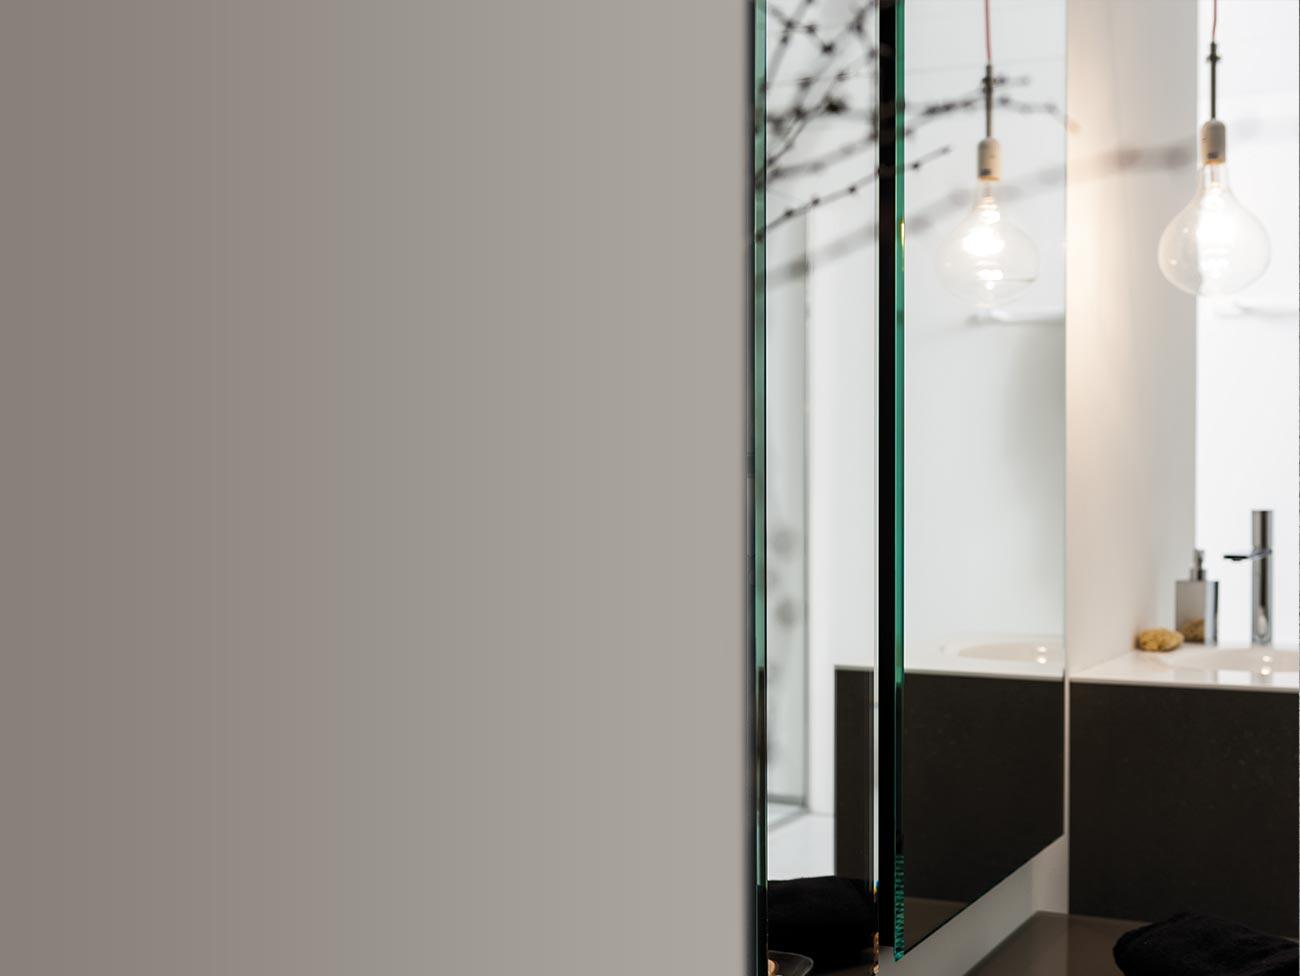 prisma info bathroom design bathroom 39 s furnishings led lighting mirrors mirrors. Black Bedroom Furniture Sets. Home Design Ideas